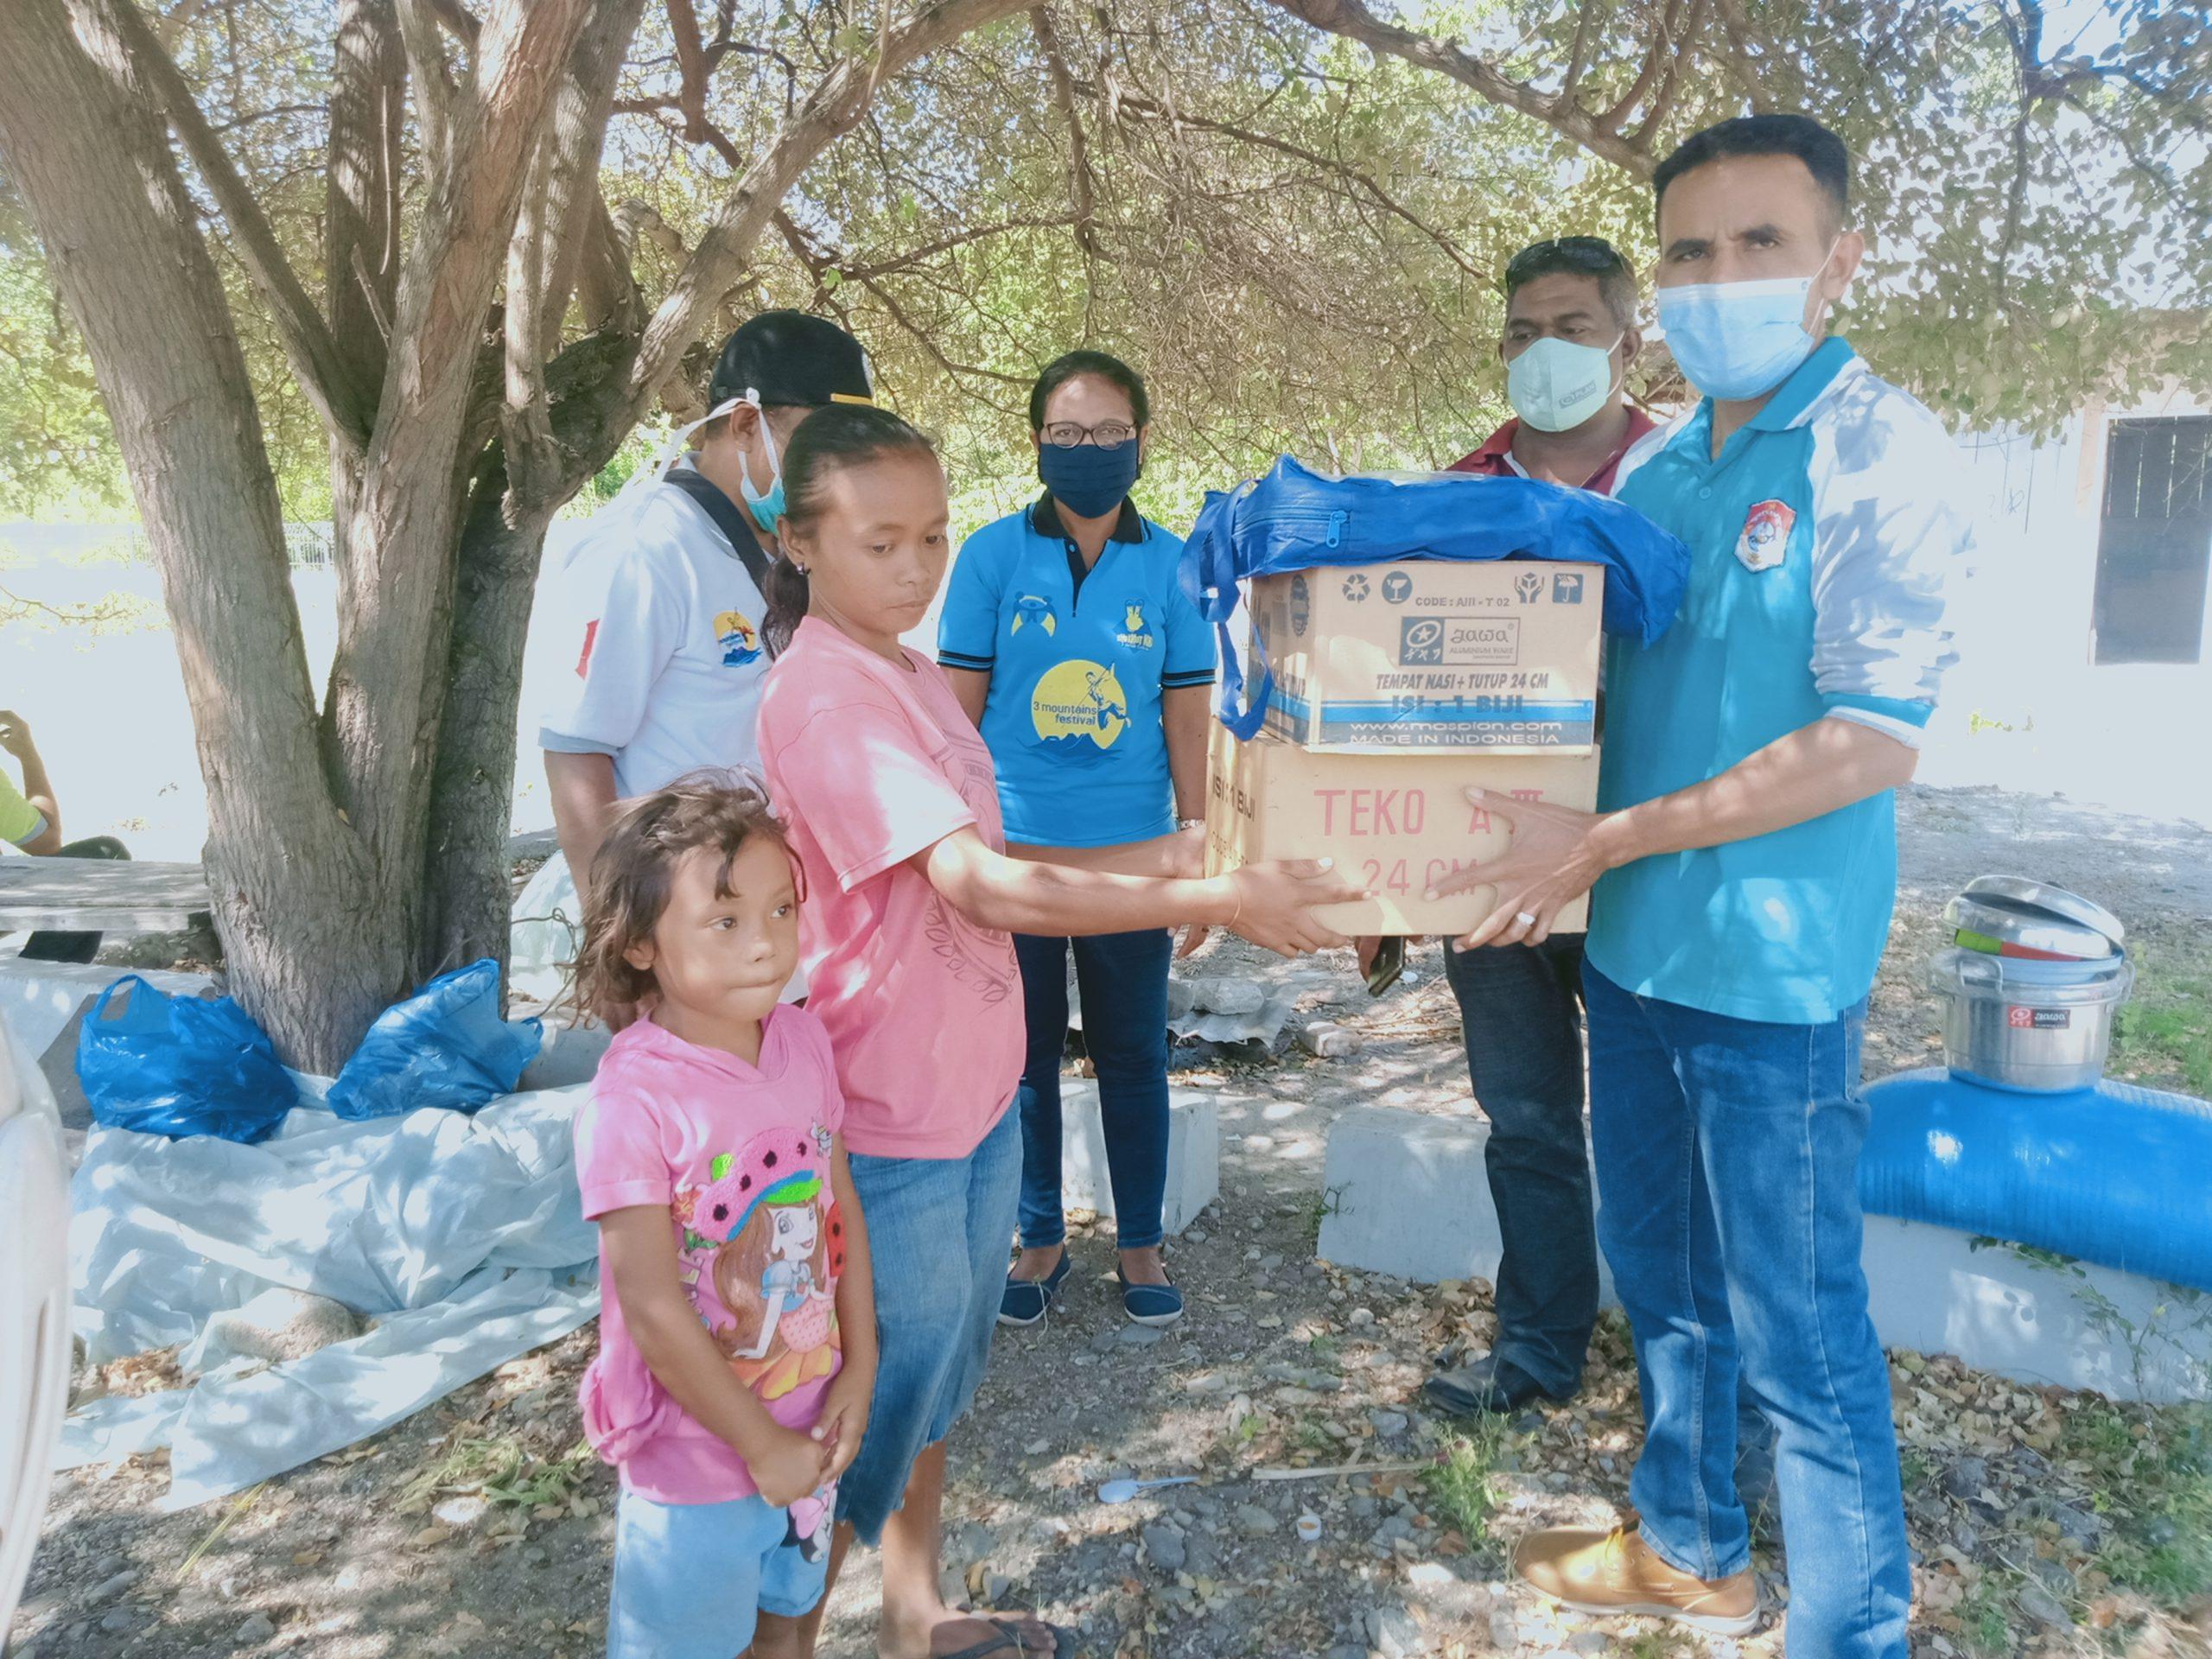 Tanggap Darurat Lintas Sektor, Bantu Janda Dan Anak Terlantar Di Pelabuhan Laut Lewoleba.